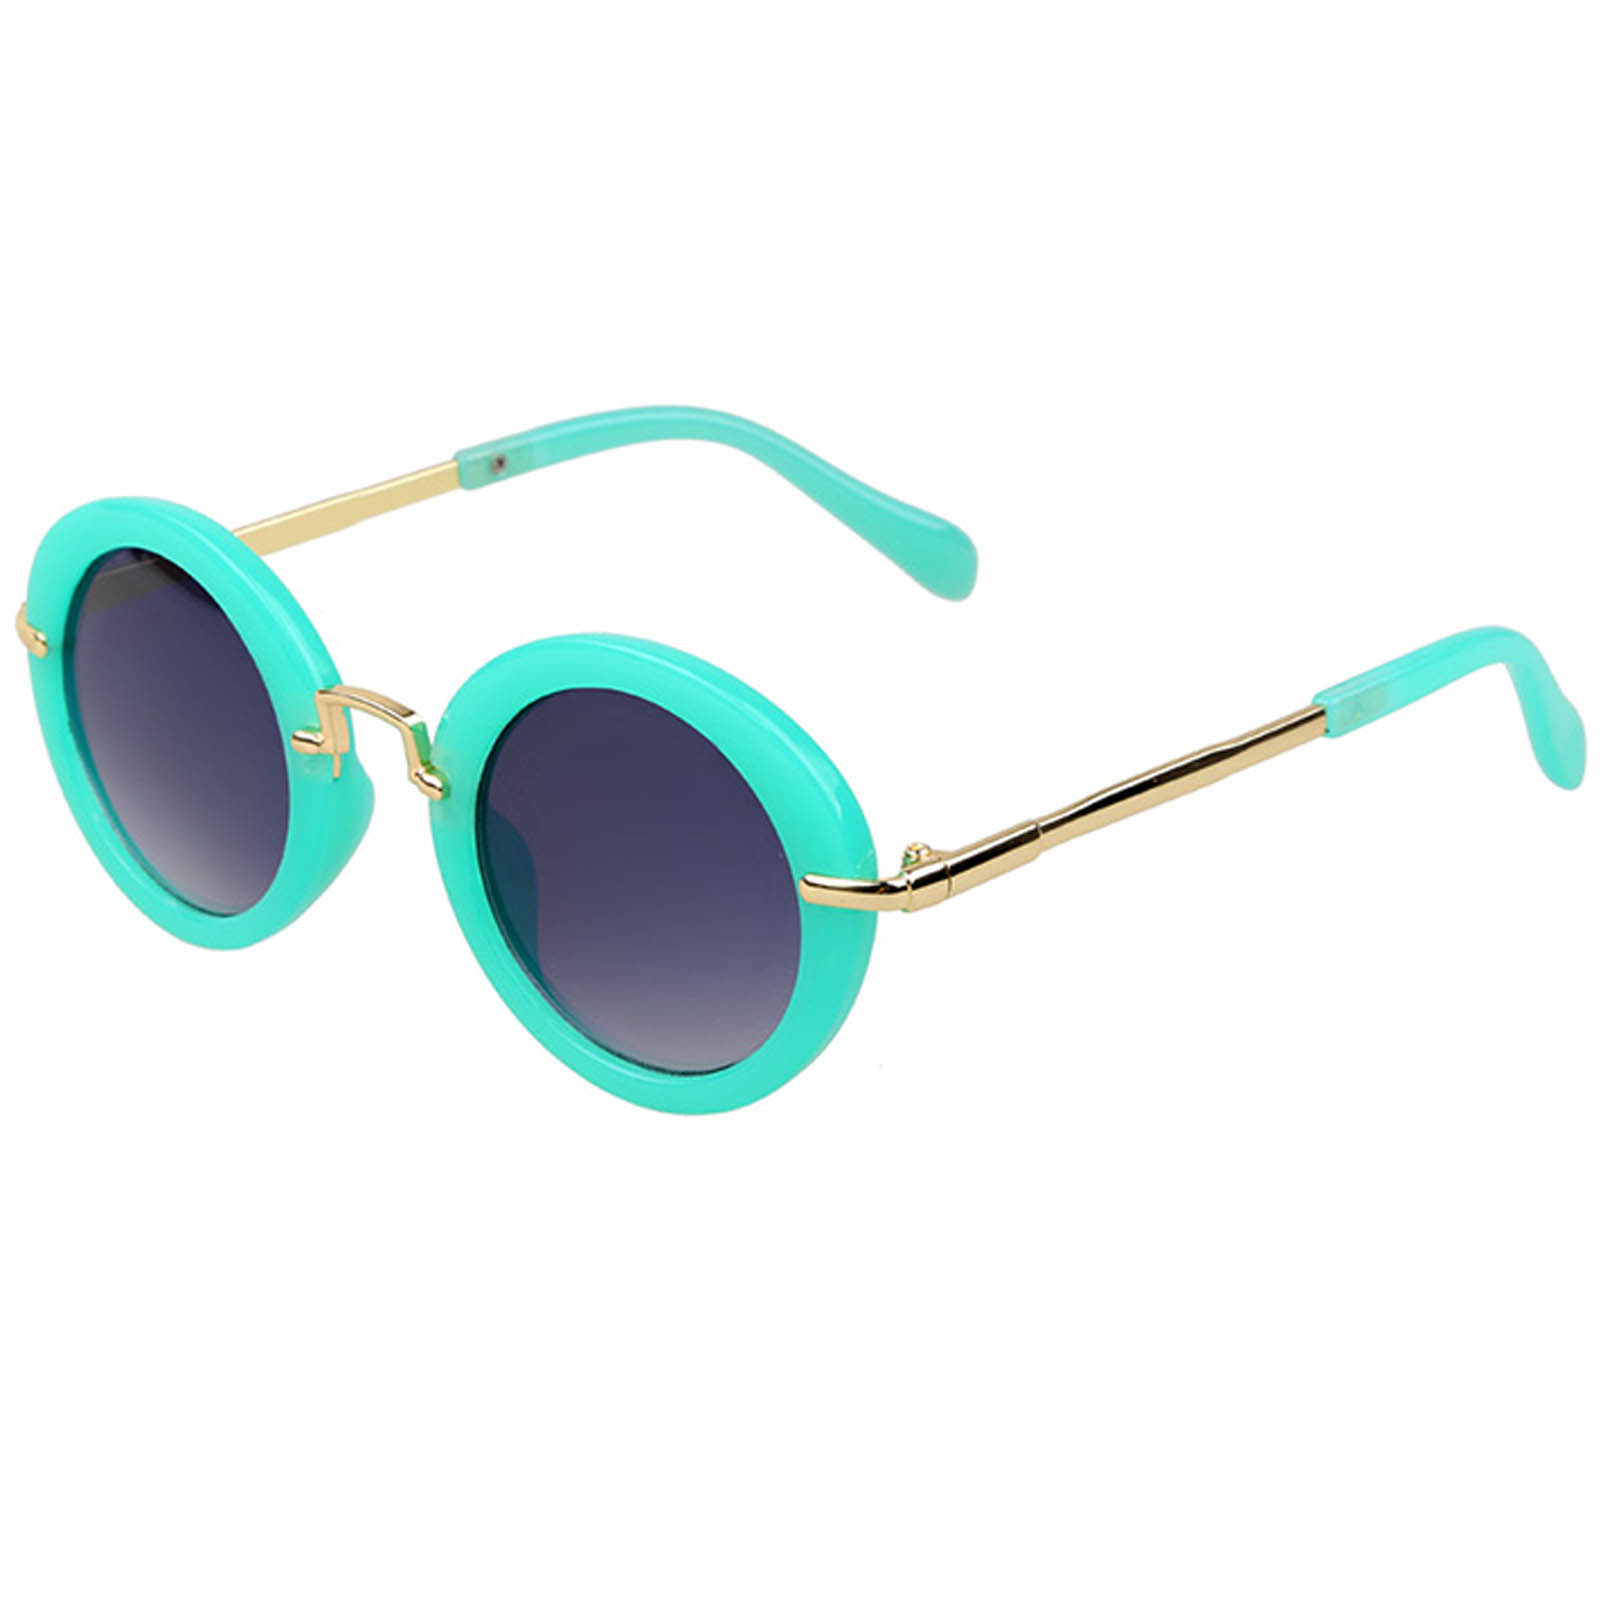 OWL ® 045 C2 Round Eyewear Sunglasses Women\'s Men\'s Metal Round ...